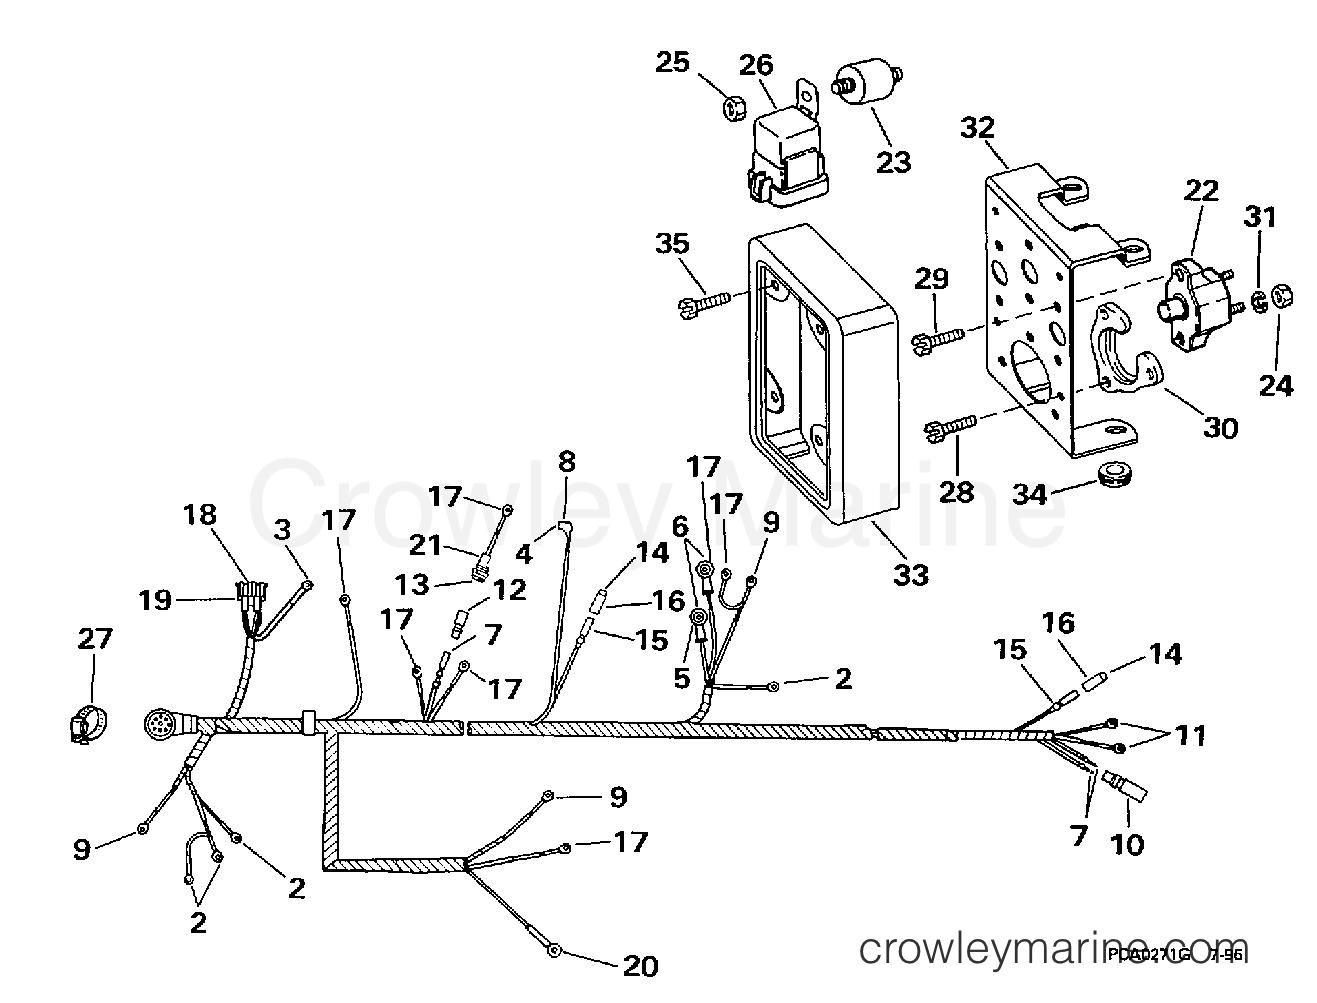 1998 OMC Stern Drive 5 - 50FBPBYC ENGINE WIRE HARNESS & BRACKET -- 2V MODELS section